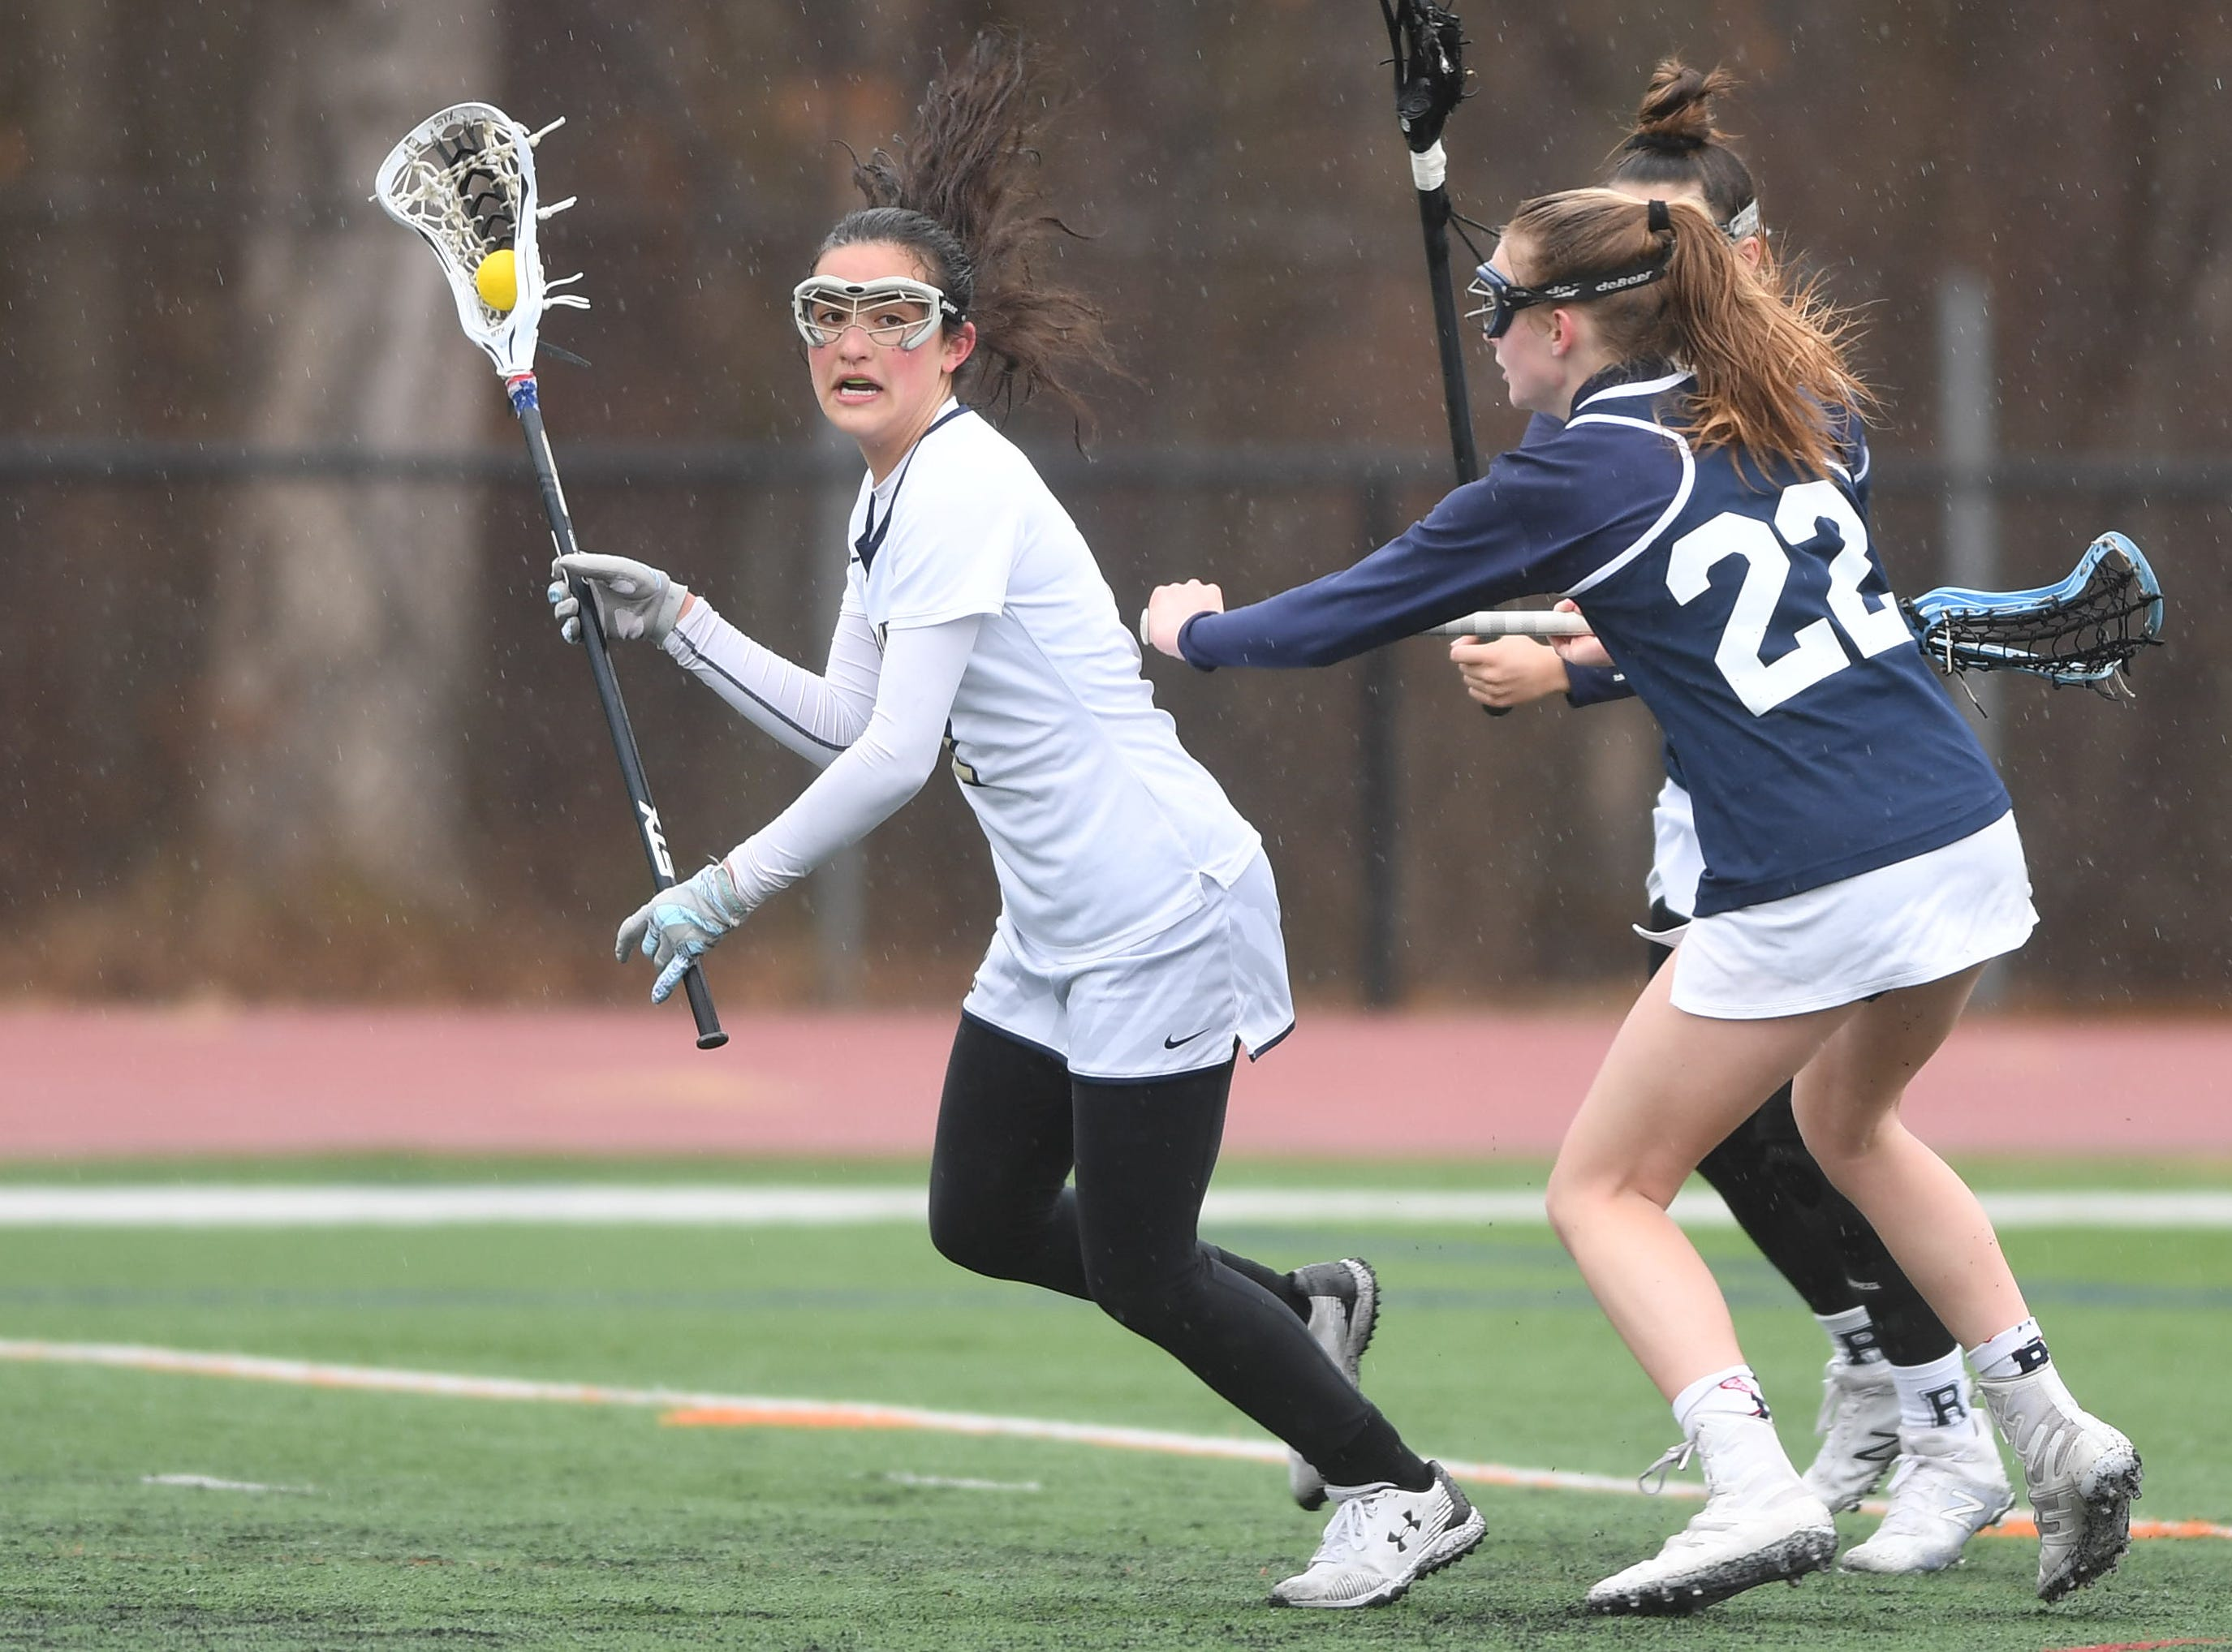 Randolph girls lacrosse at Roxbury on Friday, April 5, 2019. Roxbury  #2 Emily Stanich.